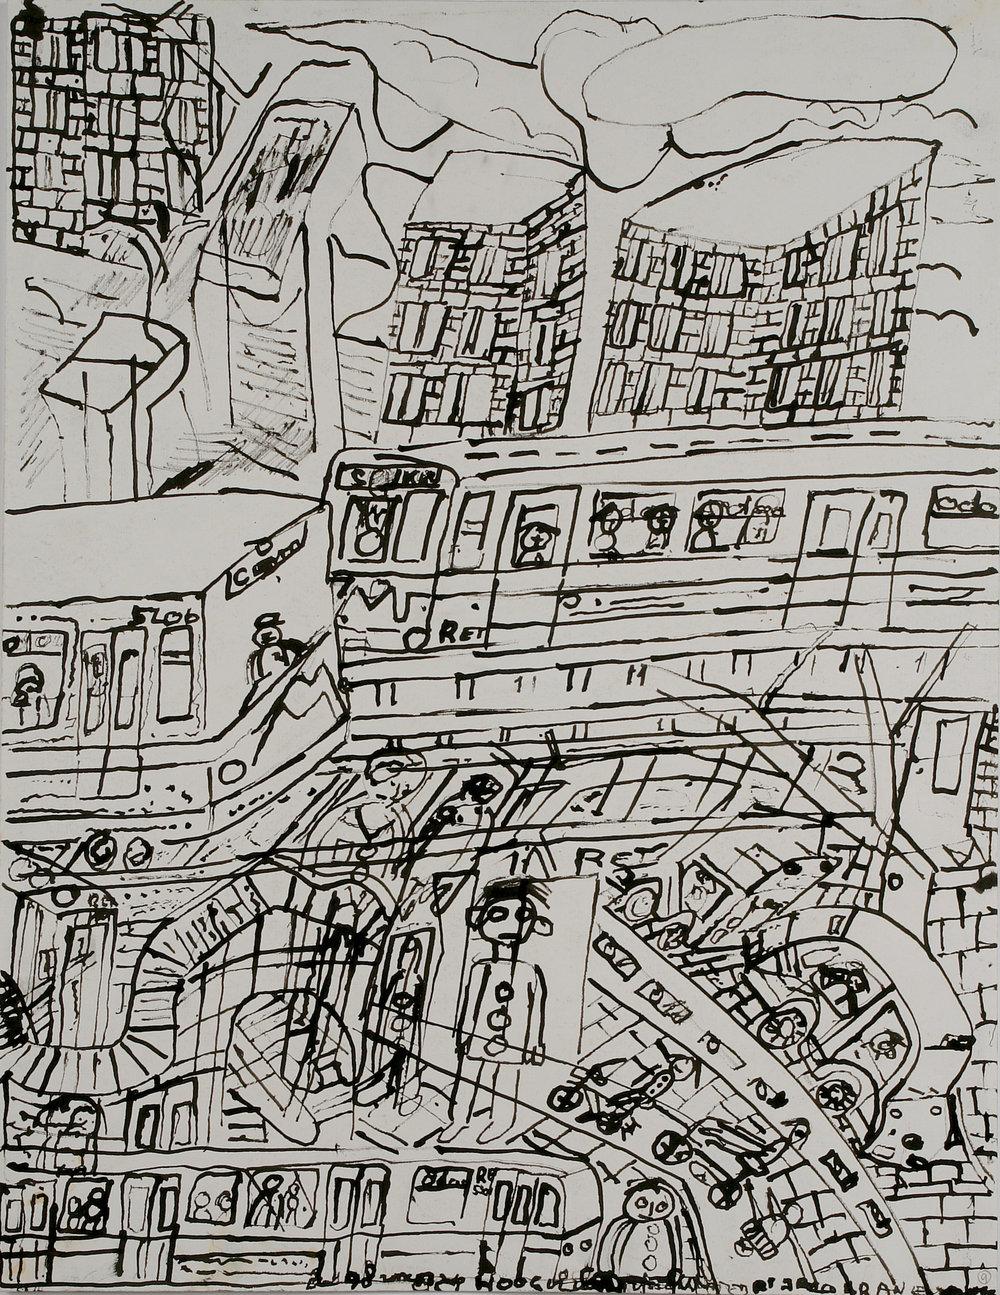 Jaco Kranendonk (Dutch, b. 1951).  Metro naar Wijnhaven (Subway to Wijnhaven) , ca. 1998. Ink on paper, 25 ½ x 19 7/8 in. Intuit: The Center of Intuitive and Outsider Art, gift of Galerie Atelier Herenplaats, Rotterdam, Netherlands, 2004.43.13